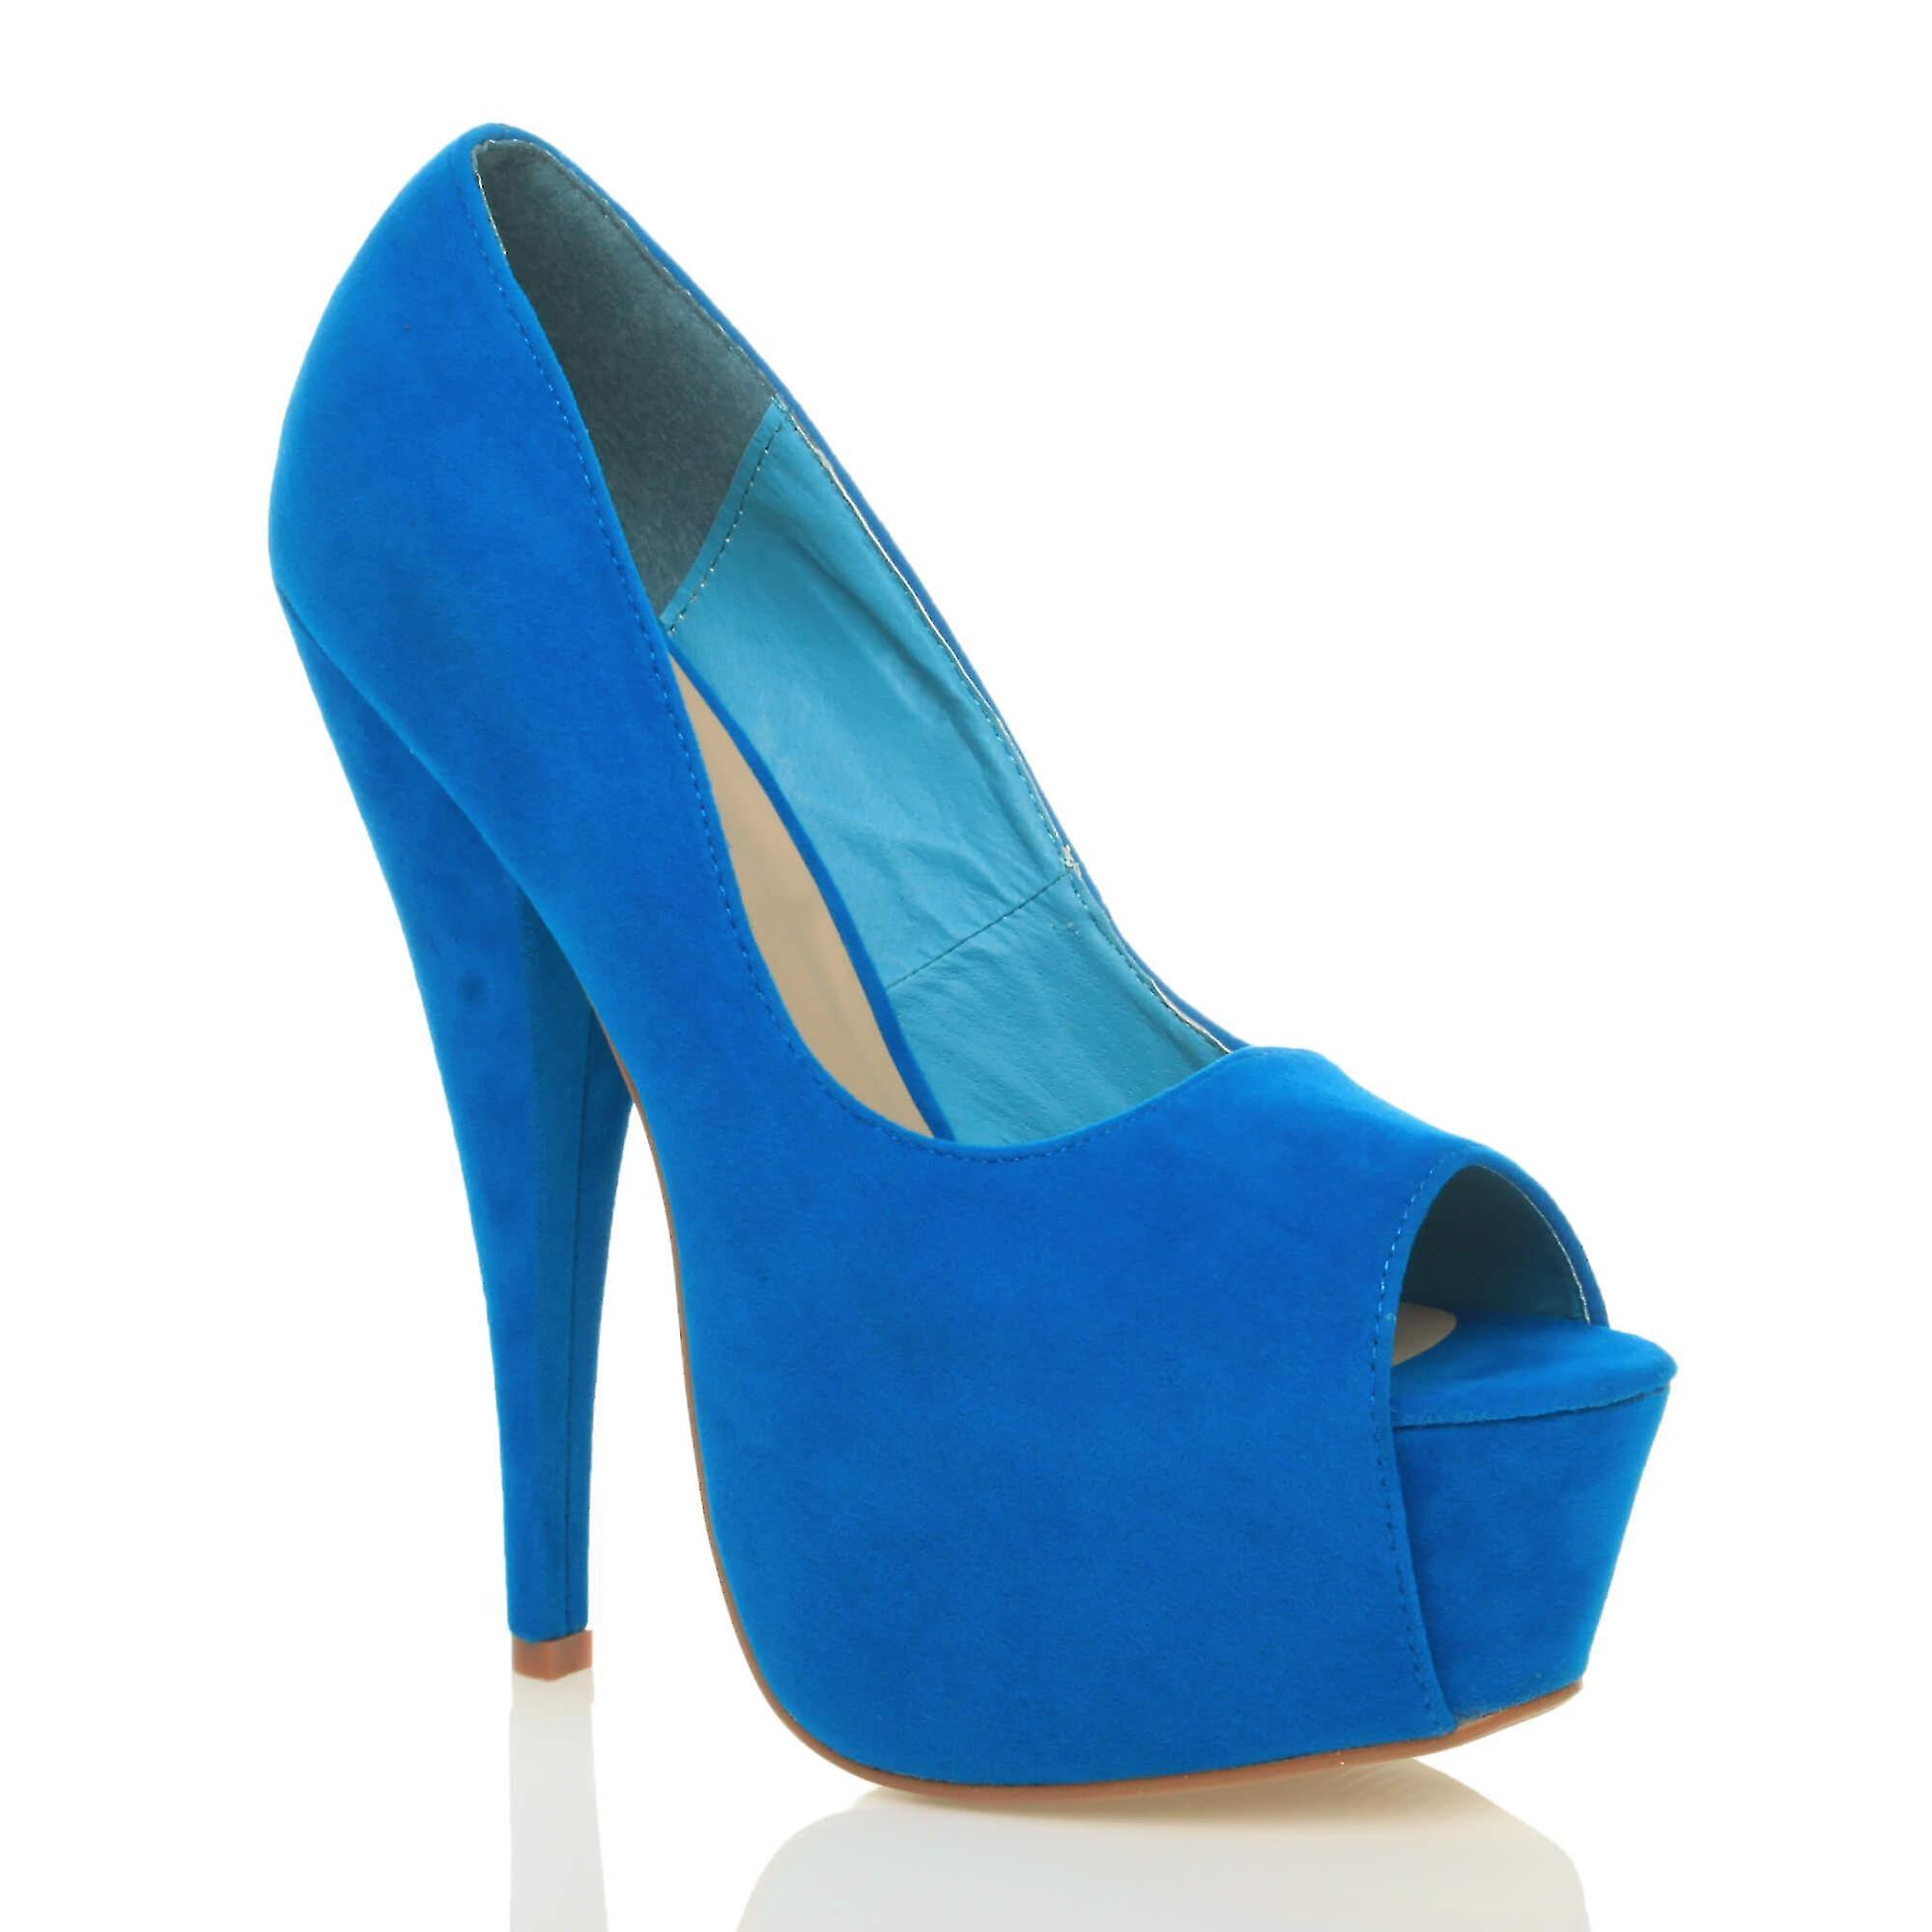 8c07e9b993 Ajvani womens high heel classic party evening peep toe court shoes sandals